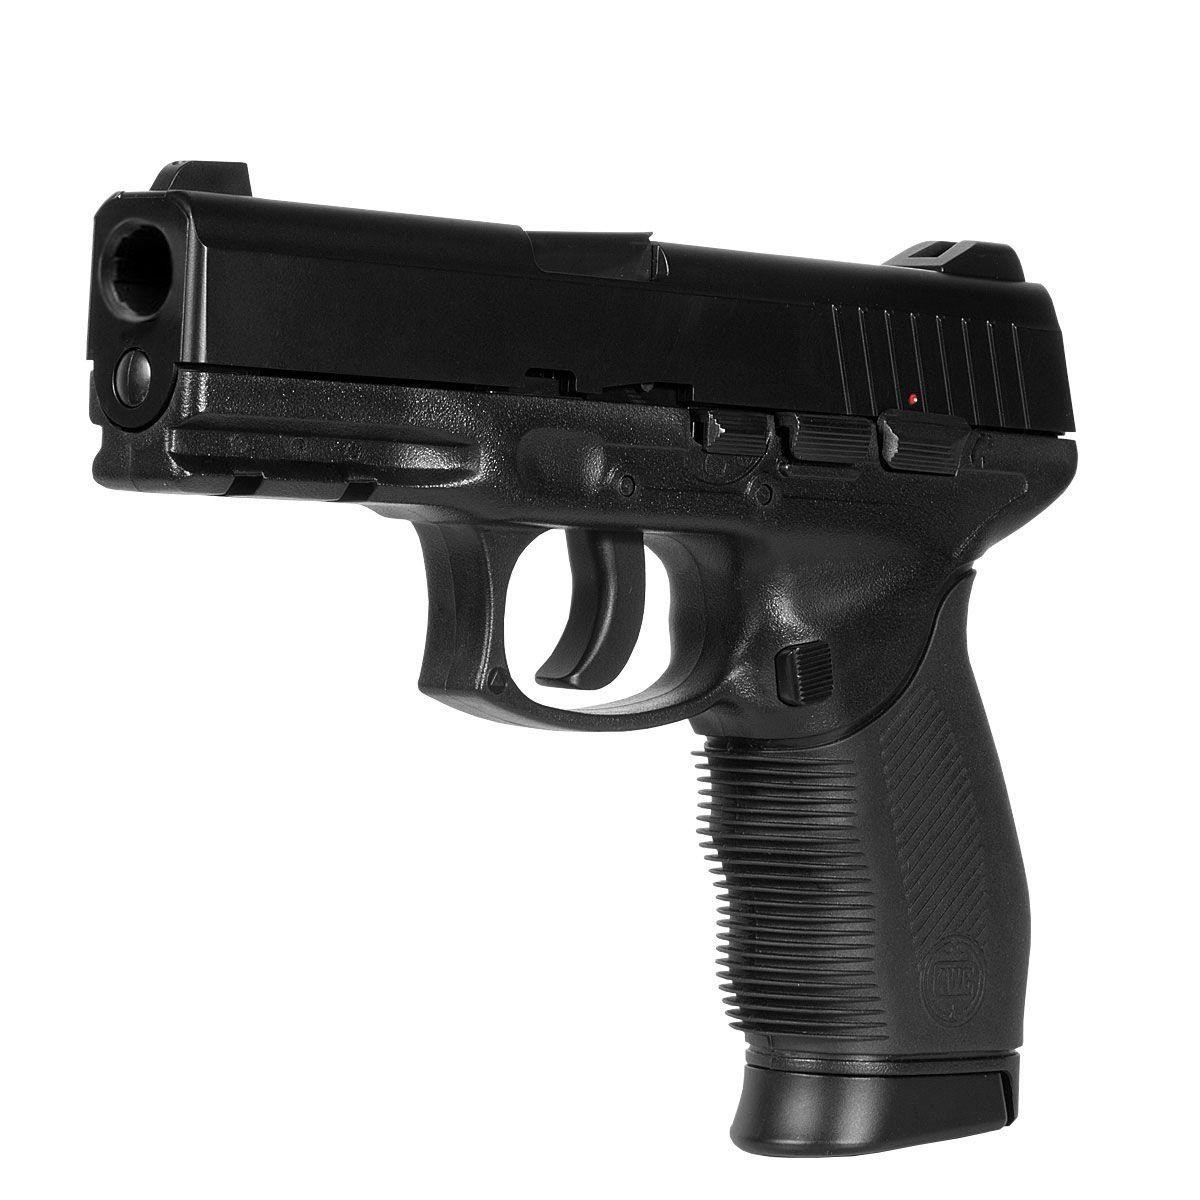 Kit Carabina Dione 5,5mm + Pistola 4,5mm + Capa Lazer e Aventura